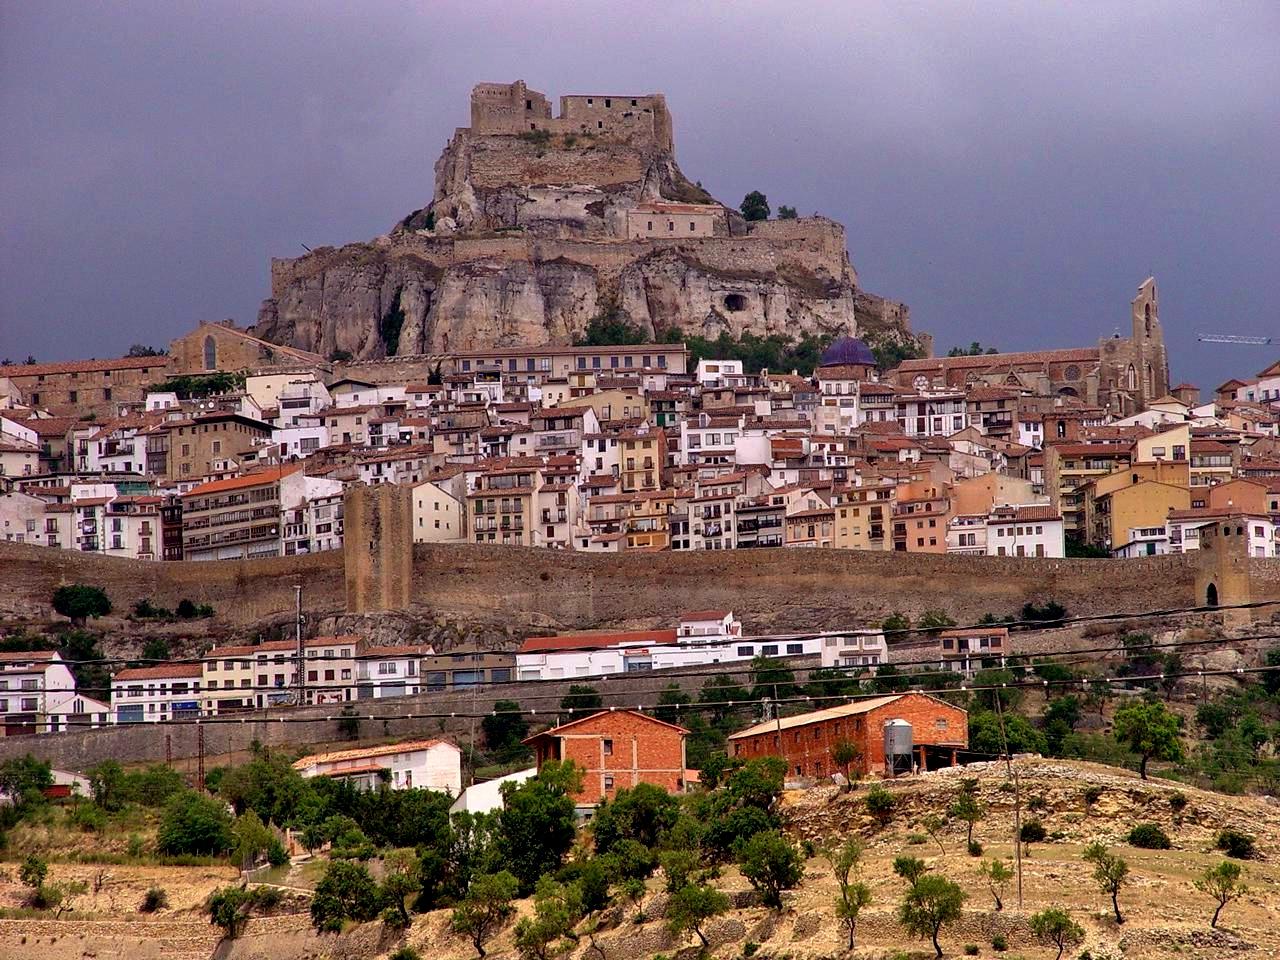 Elevation of masia cabrideta 1 morella castell n spain - Mare castellon ...